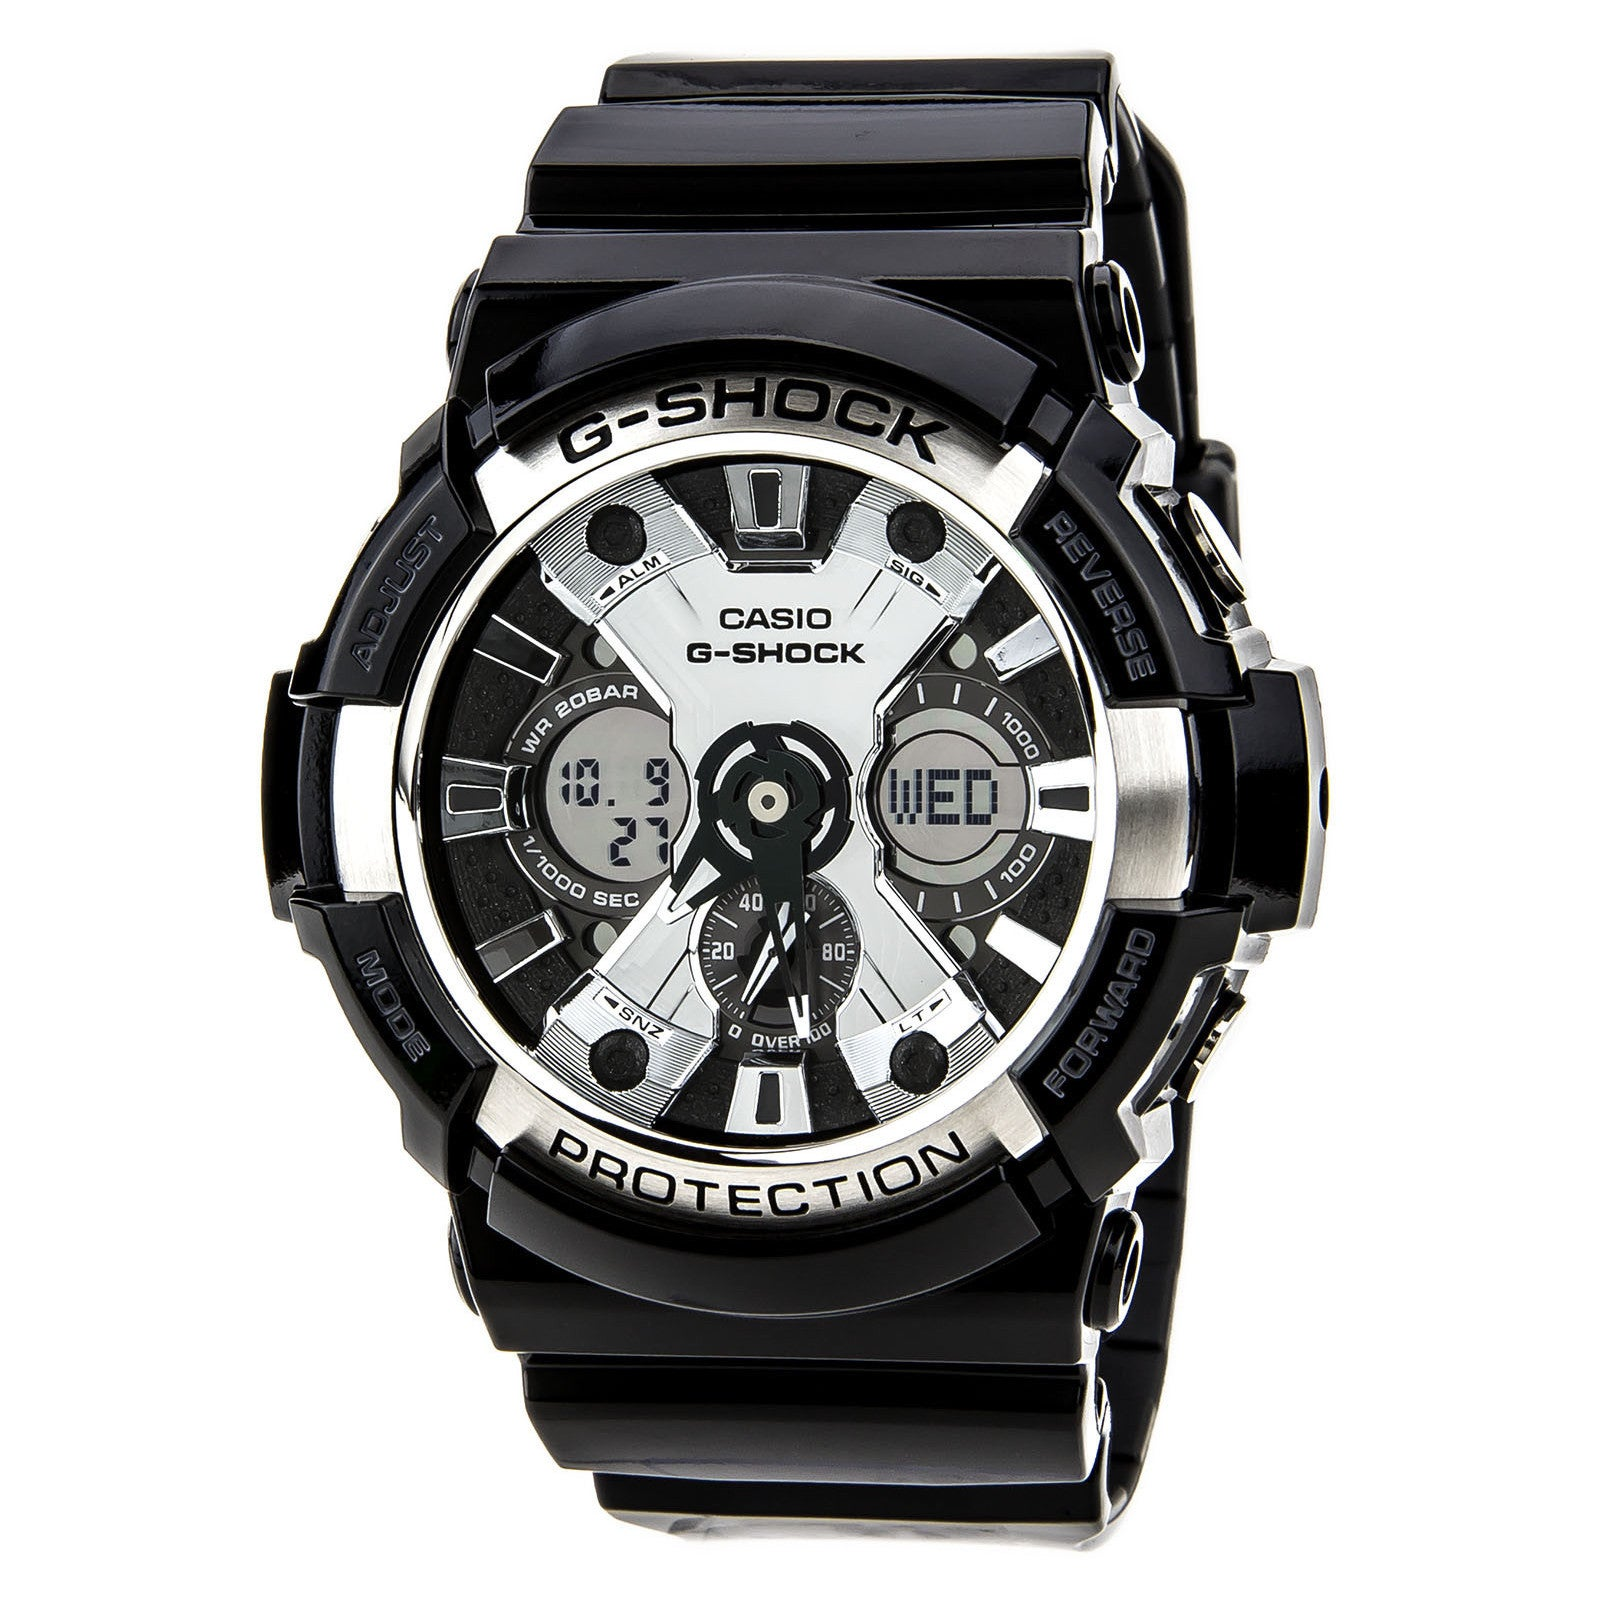 Casio Men's G-Shock XL Black Resin Band, Tough Analog/ Digital Watch (black) (Plastic)